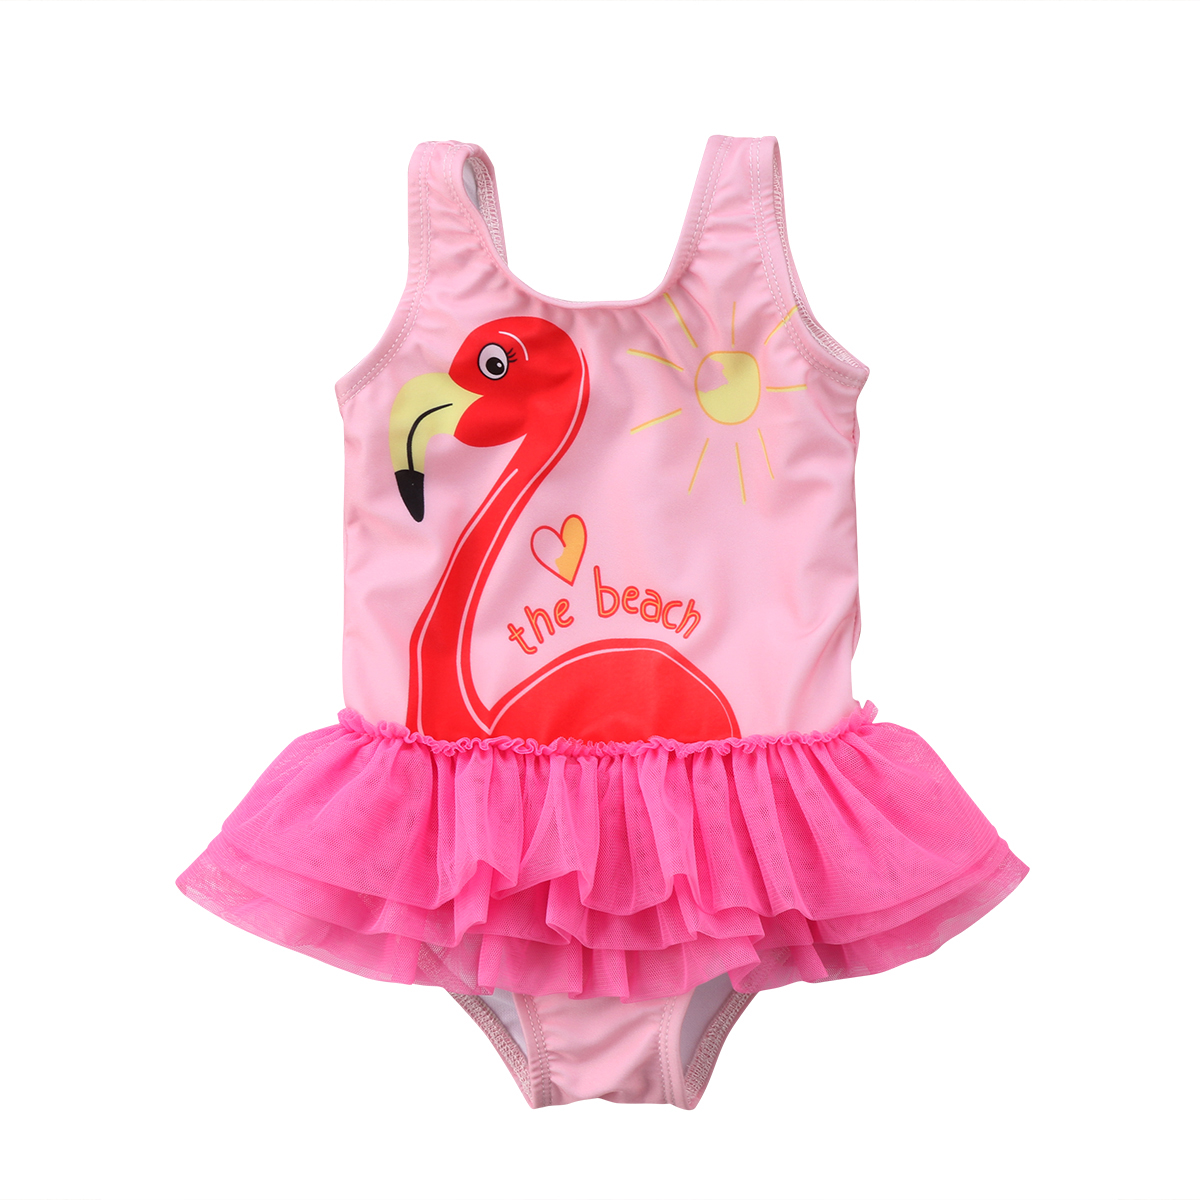 Hot Adorable Toddler Kids Baby Girls Flamingo Bikini Swimwear One-Piece Bathing Suit Beachwear Bodysuit